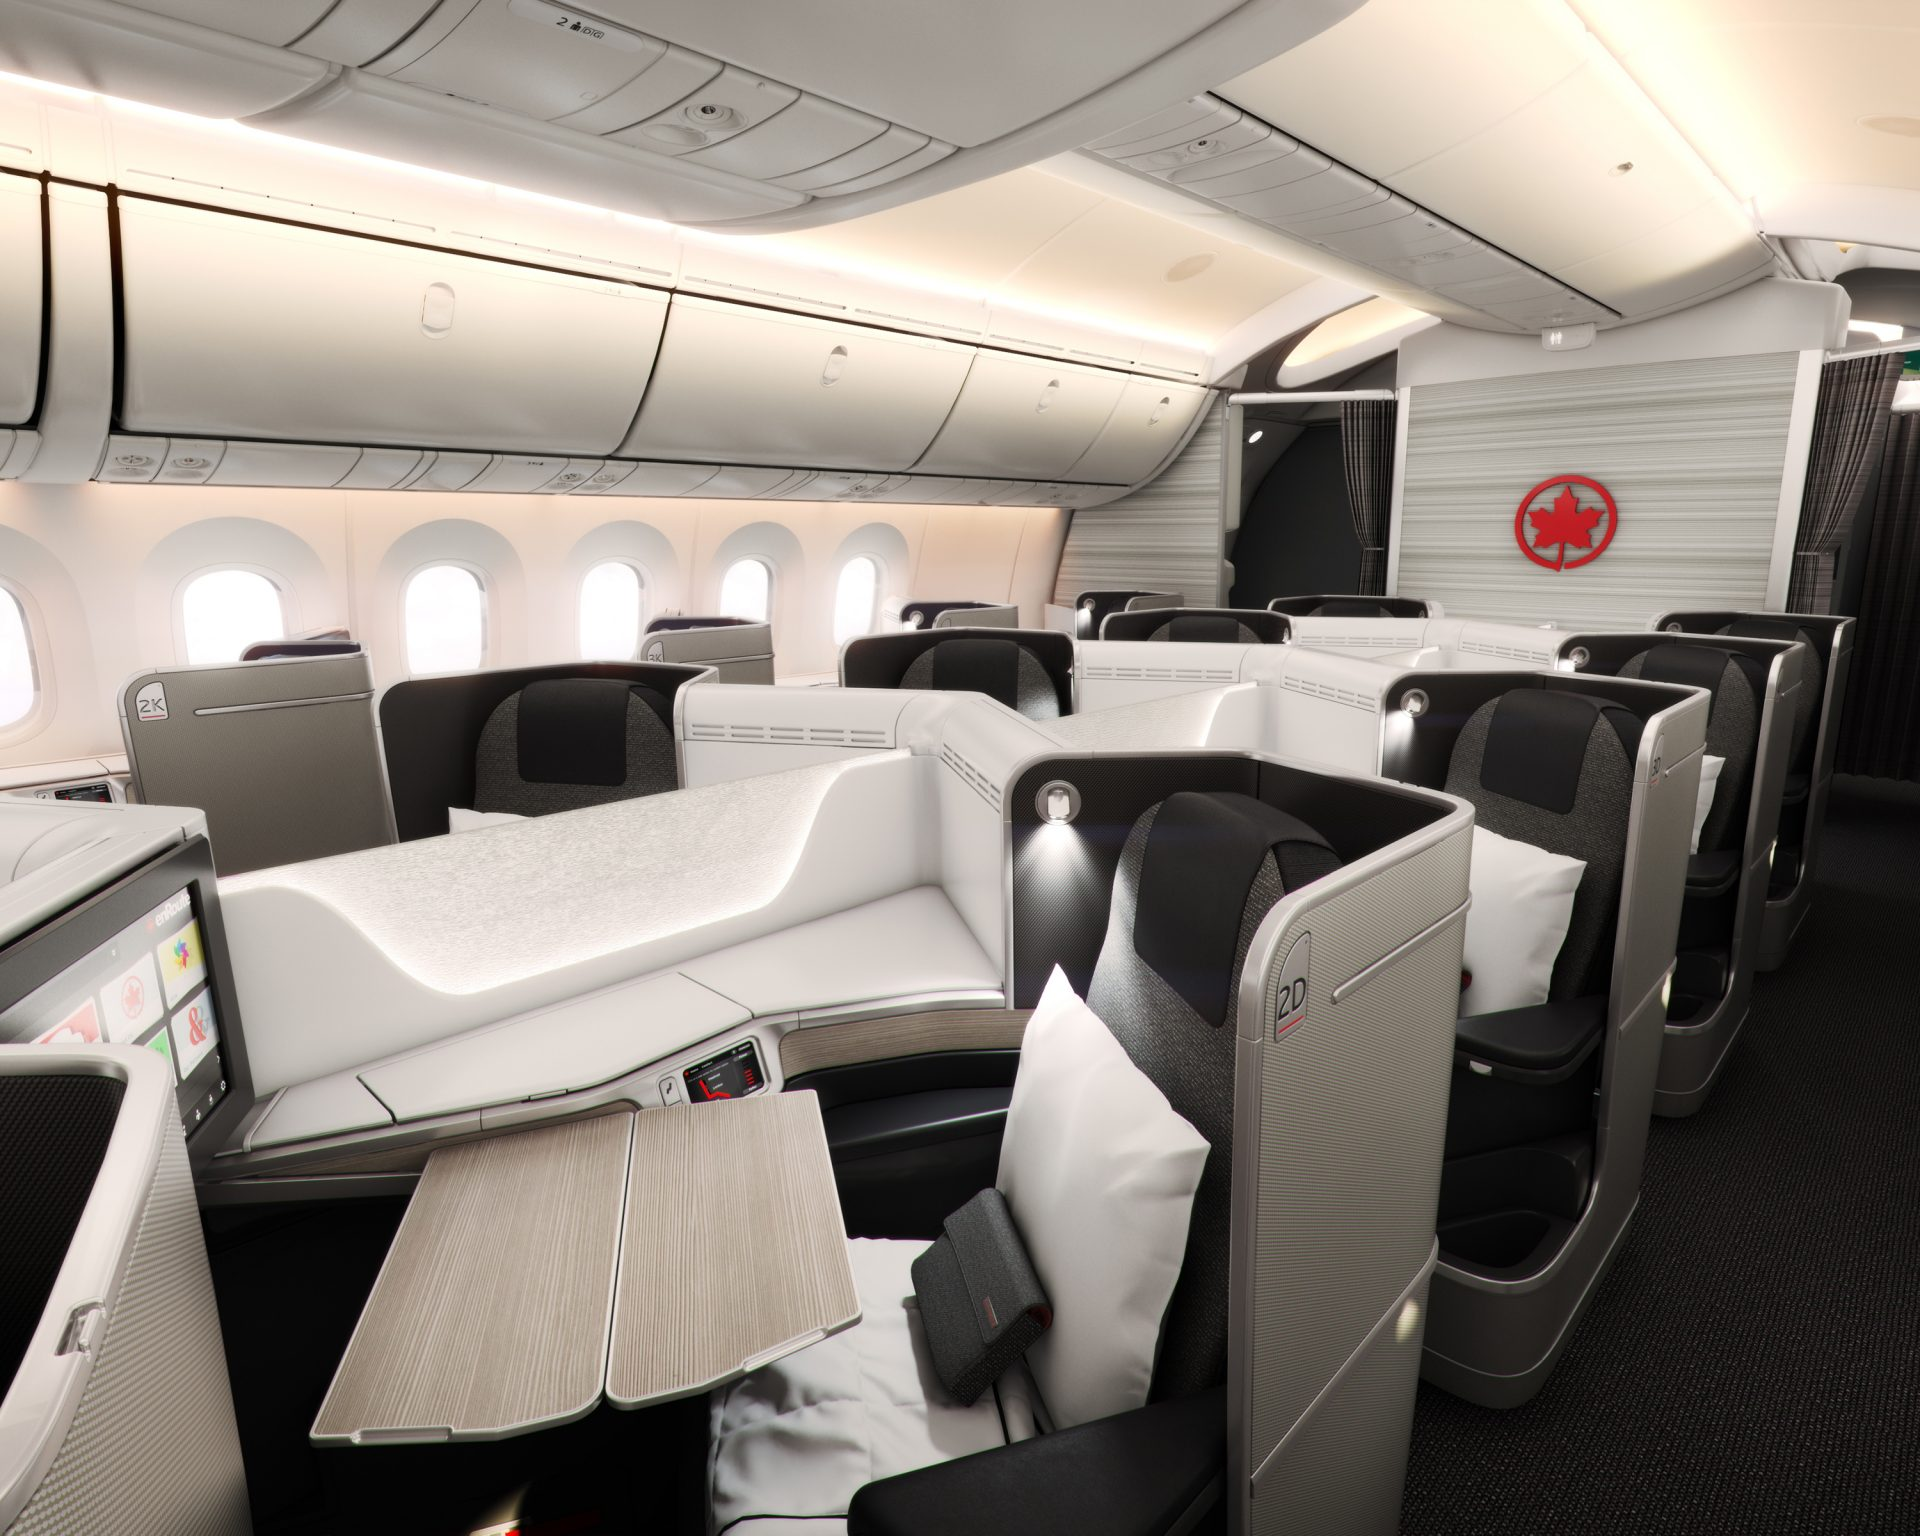 Air Canada Dreamliner Business Class